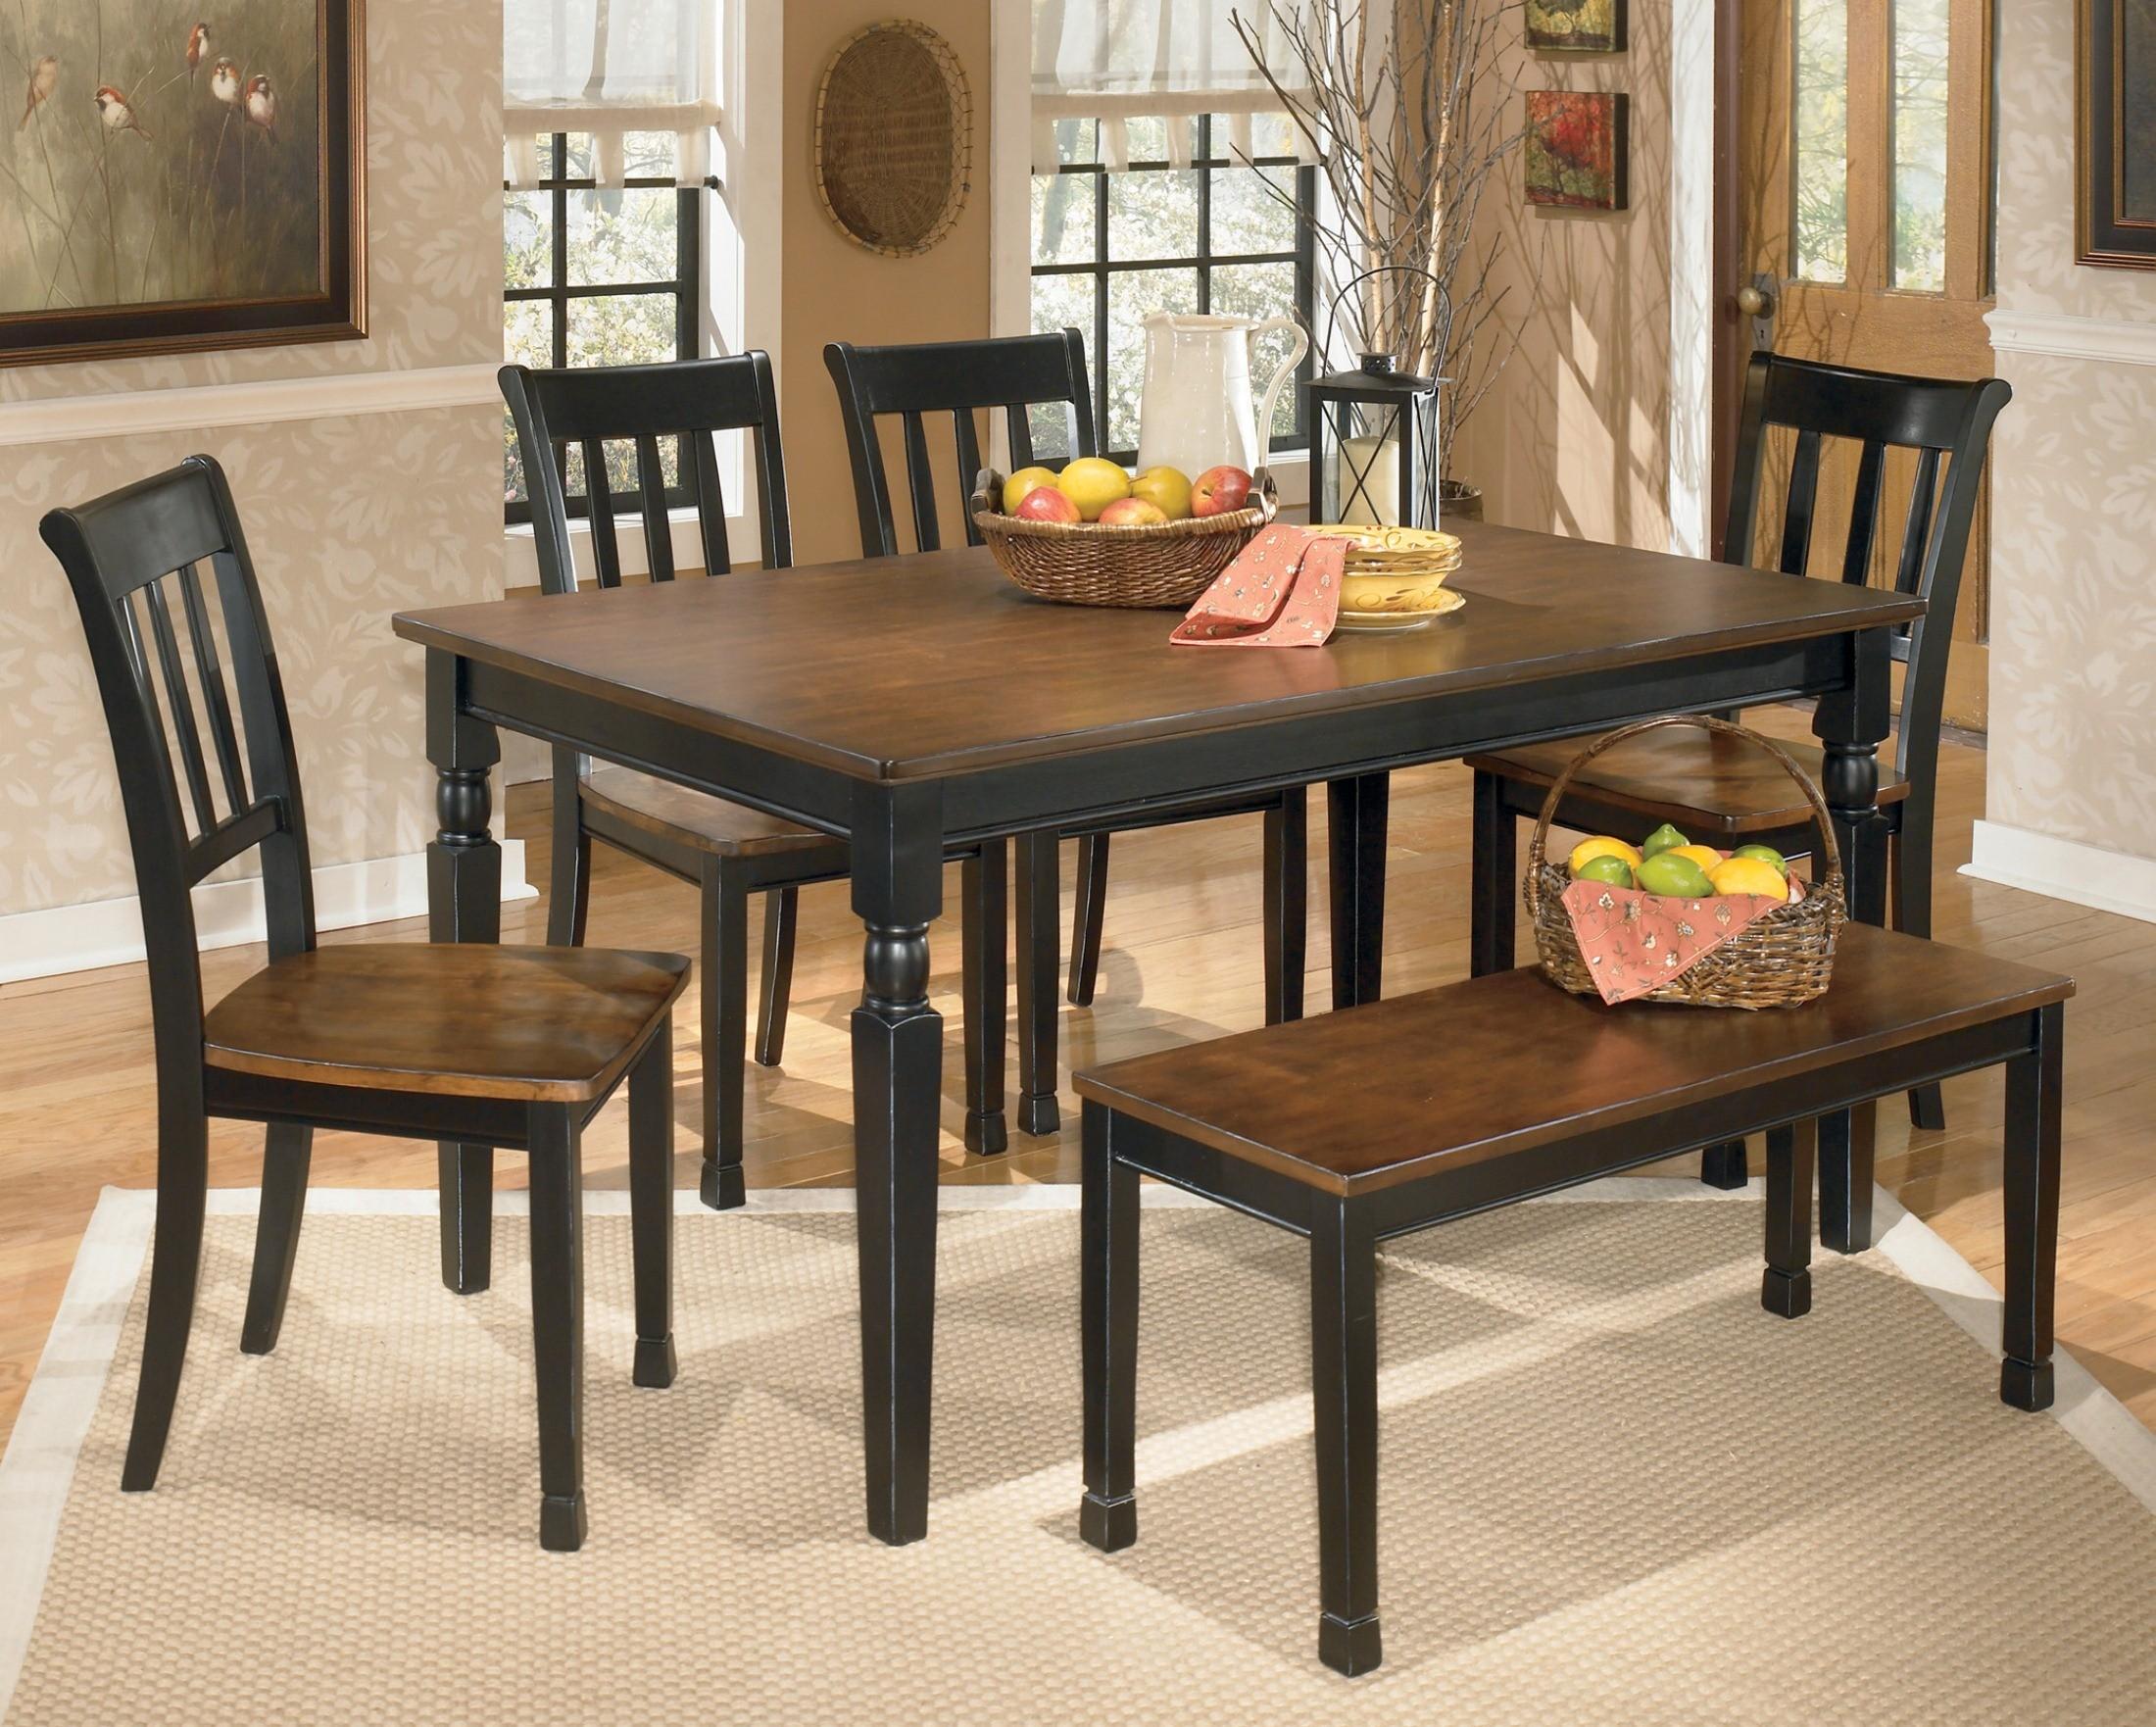 Owingsville Rectangular Dining Room Set From Ashley (D580